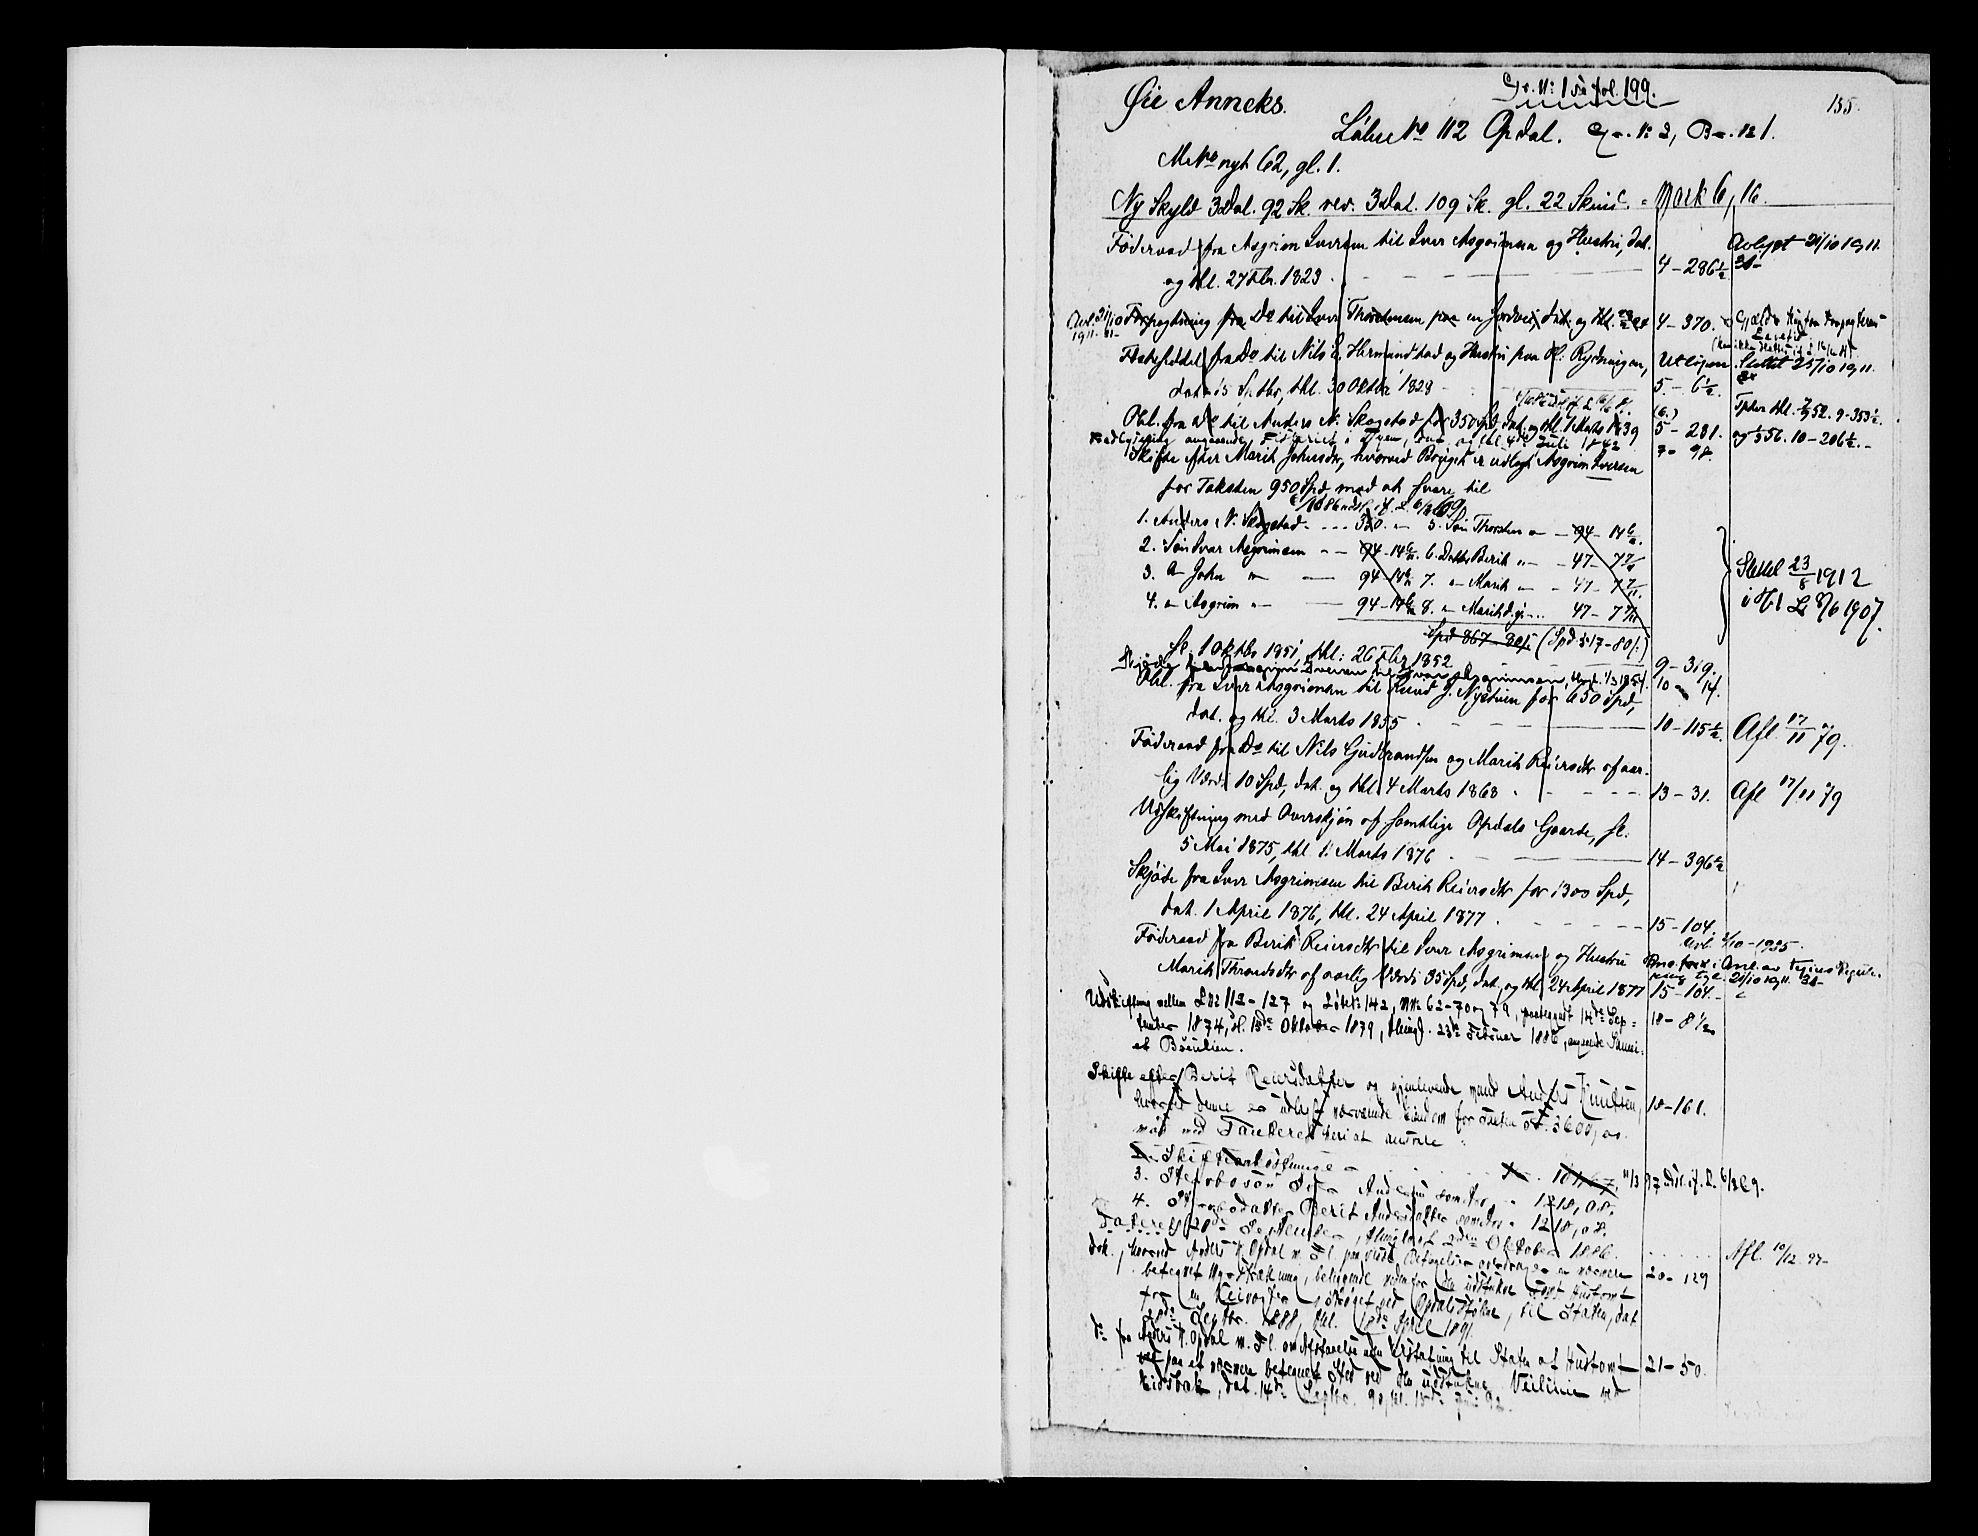 SAH, Valdres sorenskriveri, H/Ha/Had/Hada/L0011/0002: Panteregister nr. 4.11B, 1876-1940, s. 155